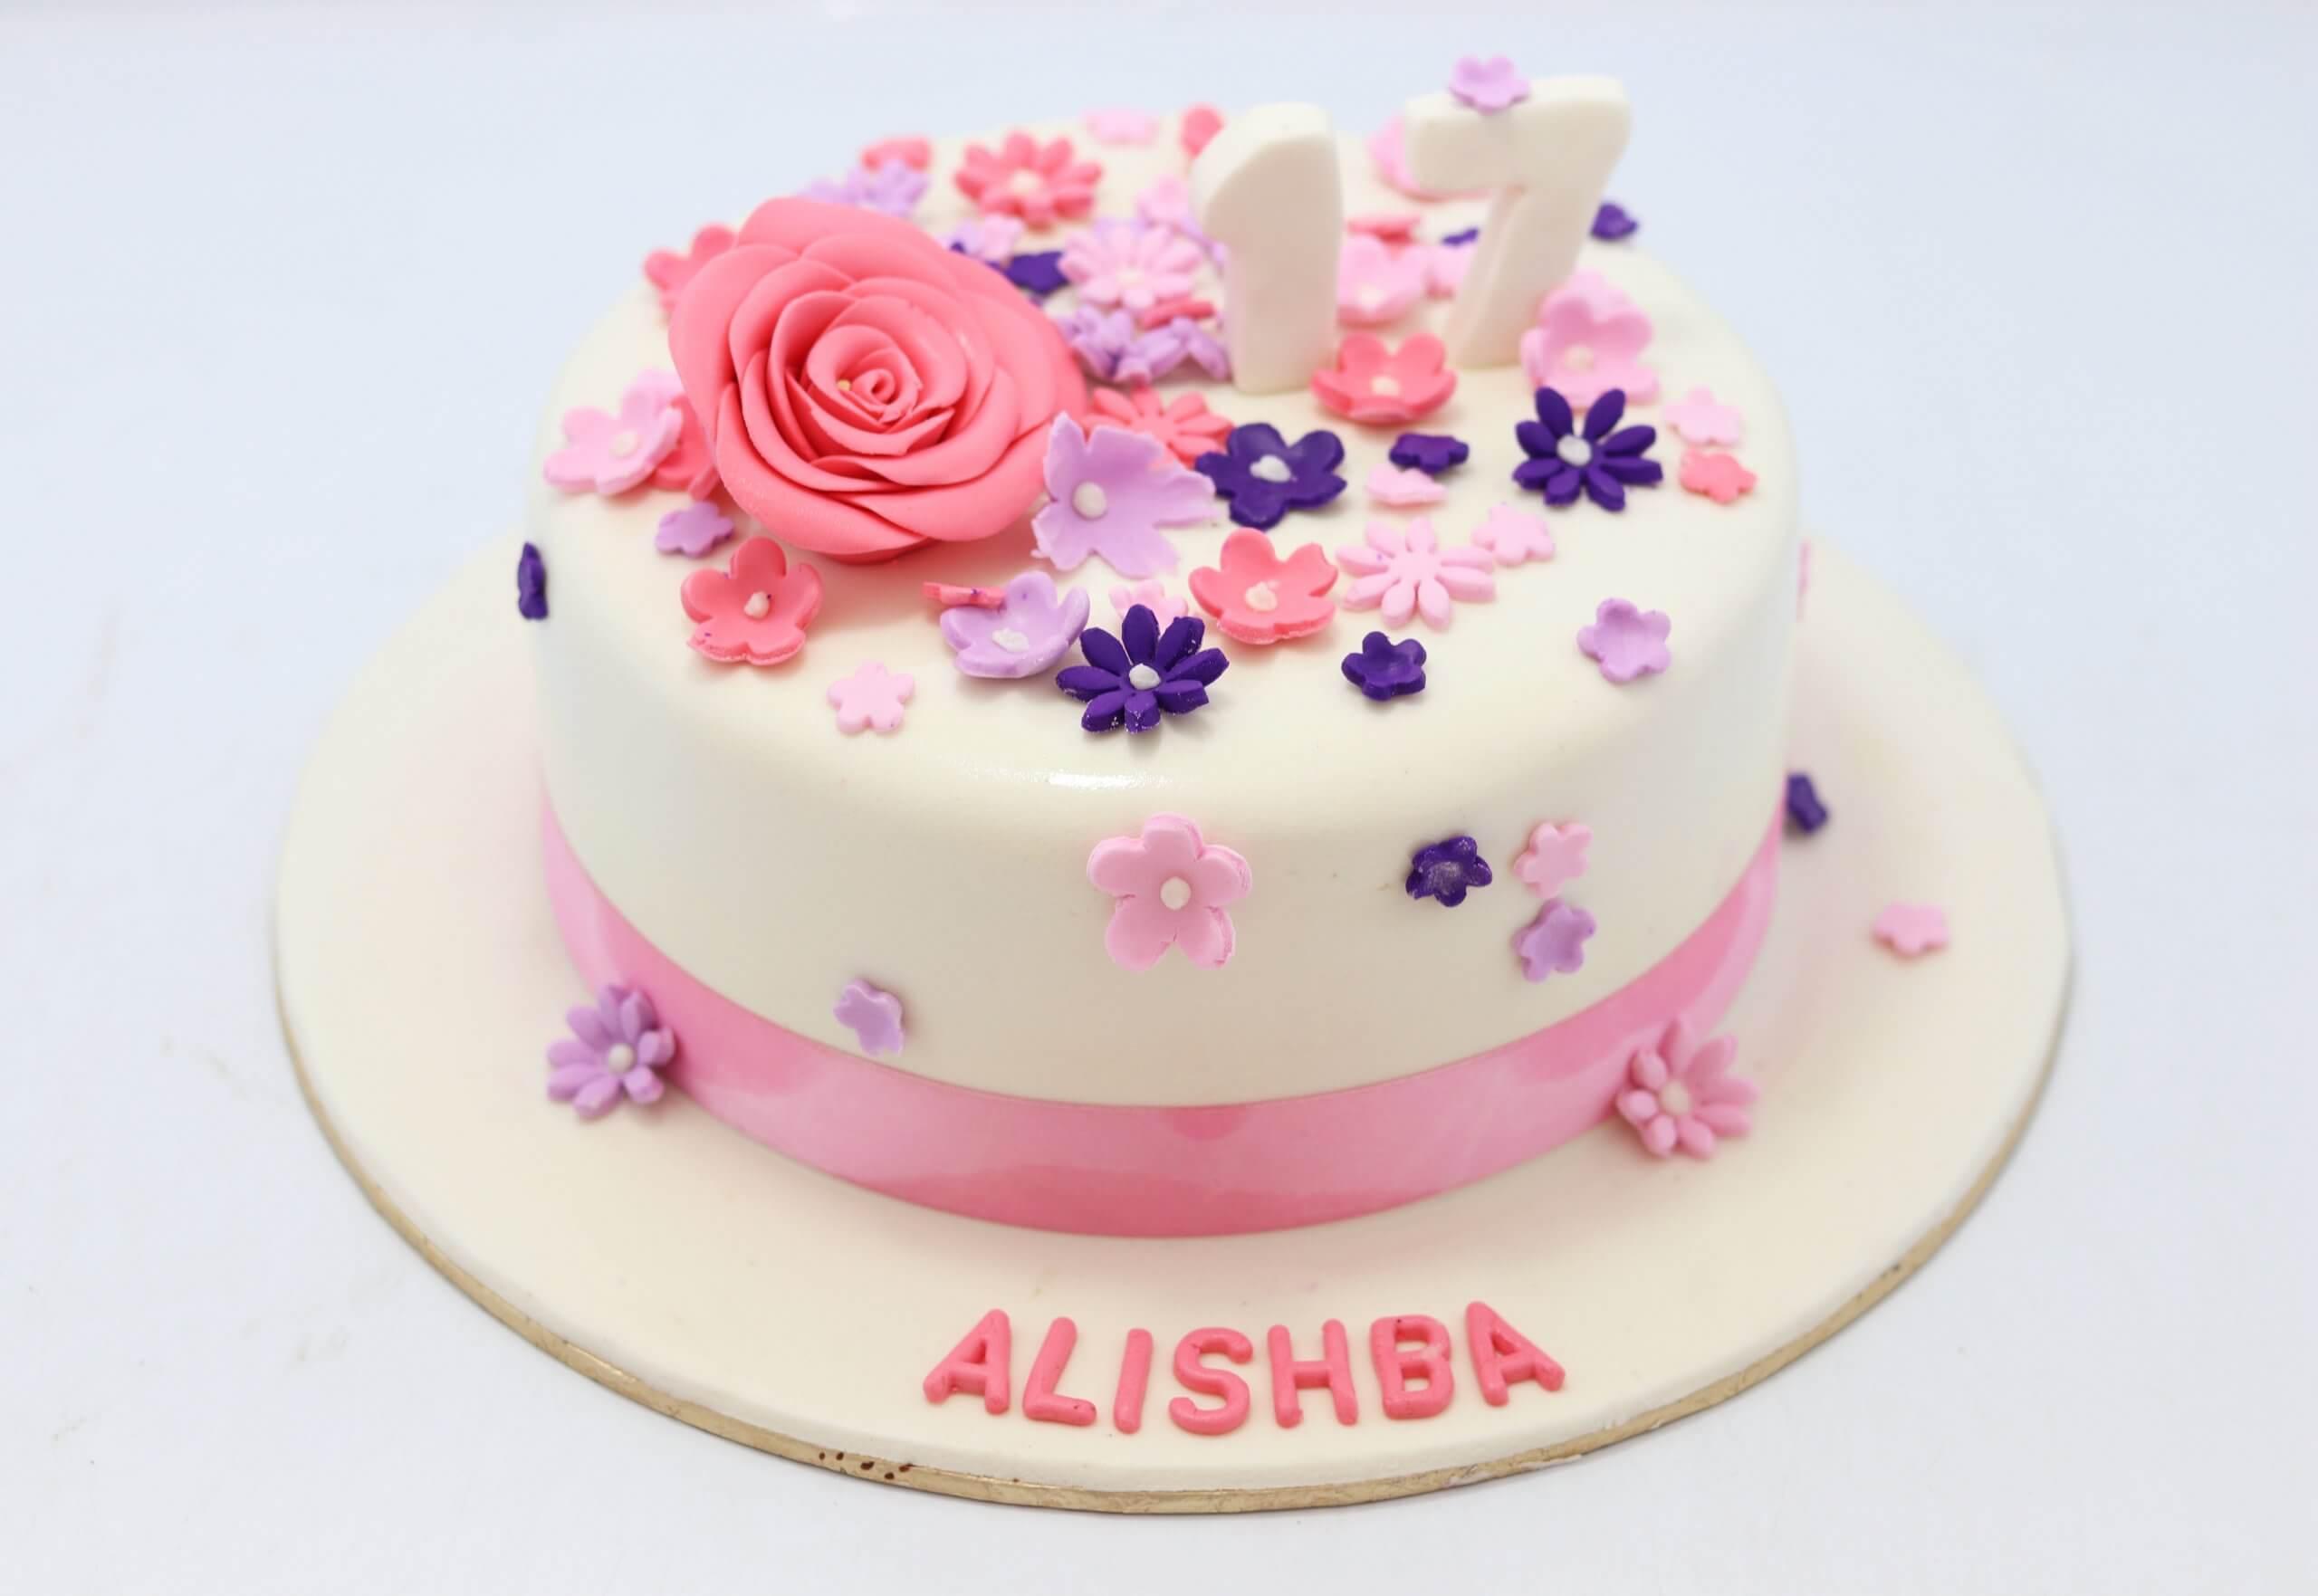 Remarkable Pink Flower Birthday Cake Find Cake At Your Doorsteps Funny Birthday Cards Online Hetedamsfinfo